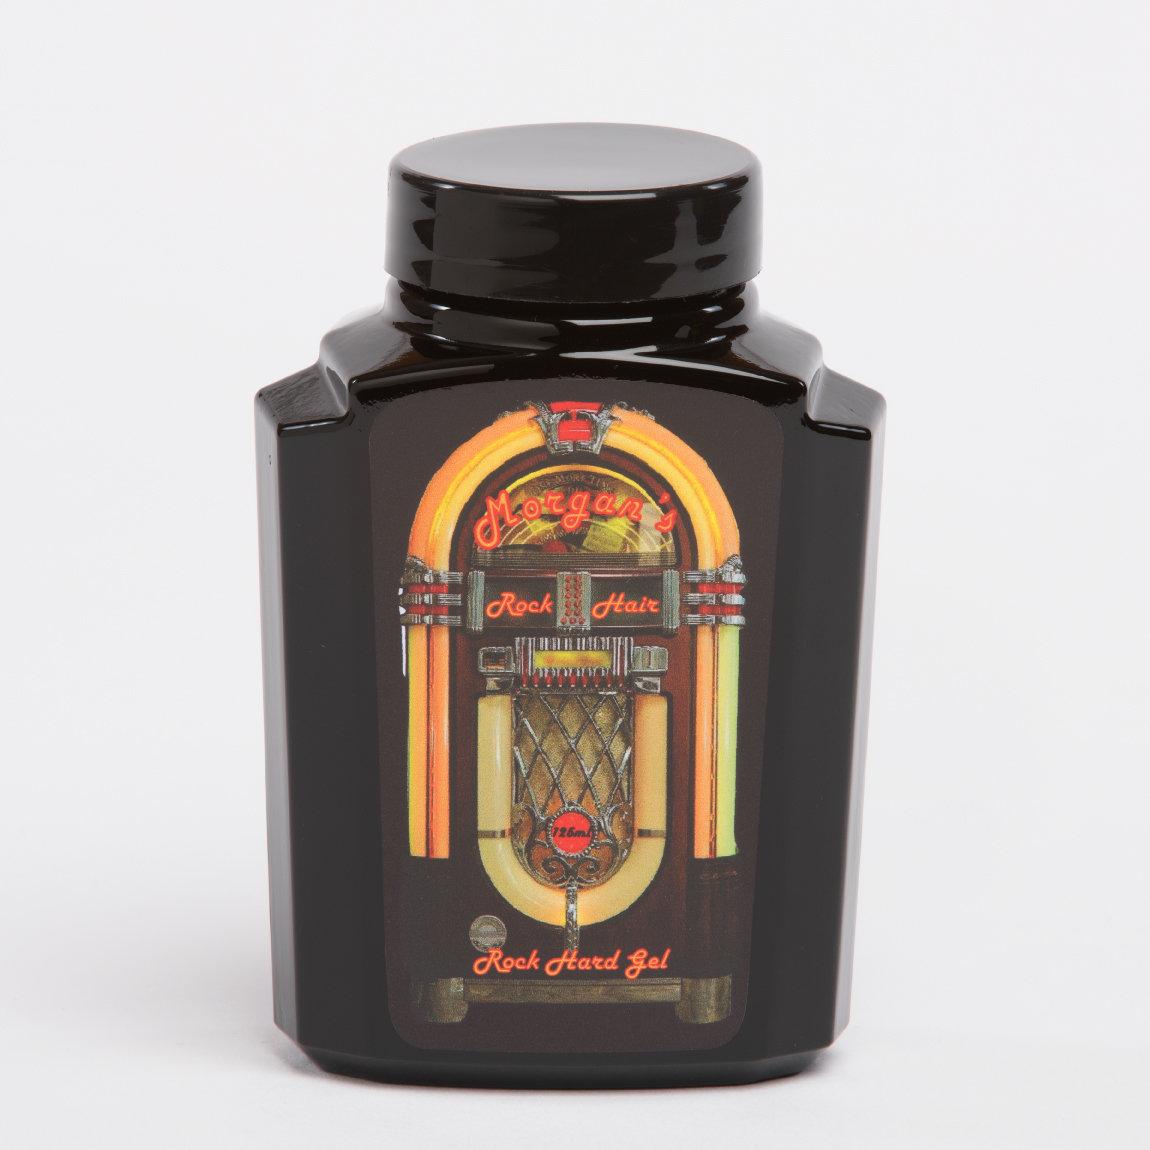 Morgans Rock Hard Gel - Гель для укладки волос 125 мл